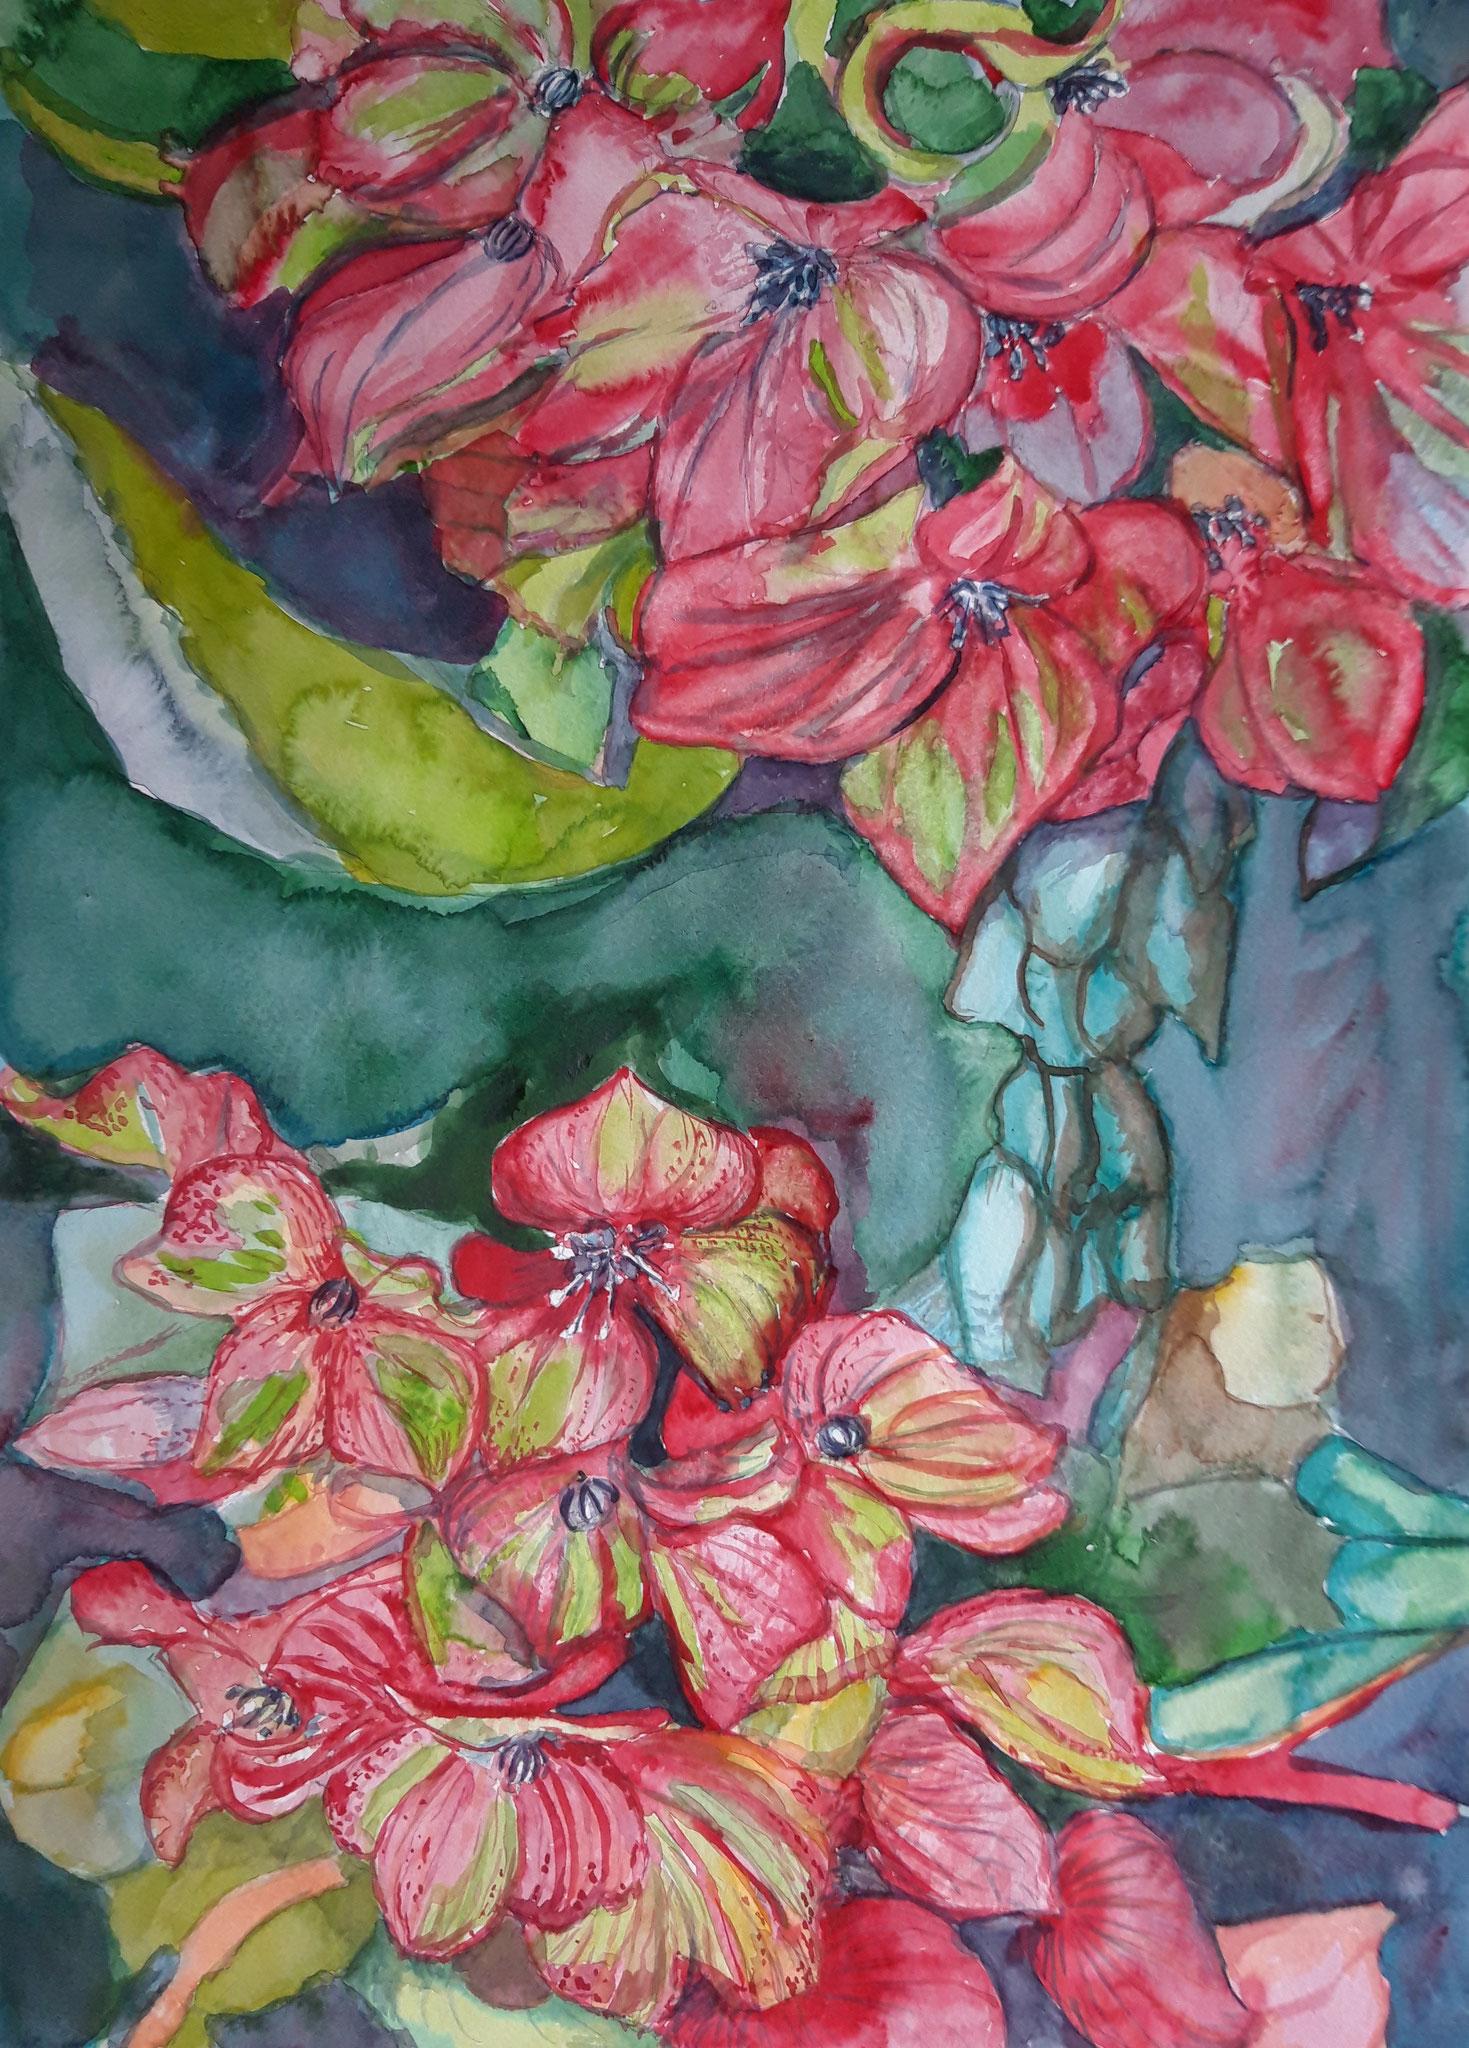 Hortensien 2019, Aquarell auf Bütten, 48 x 36 cm